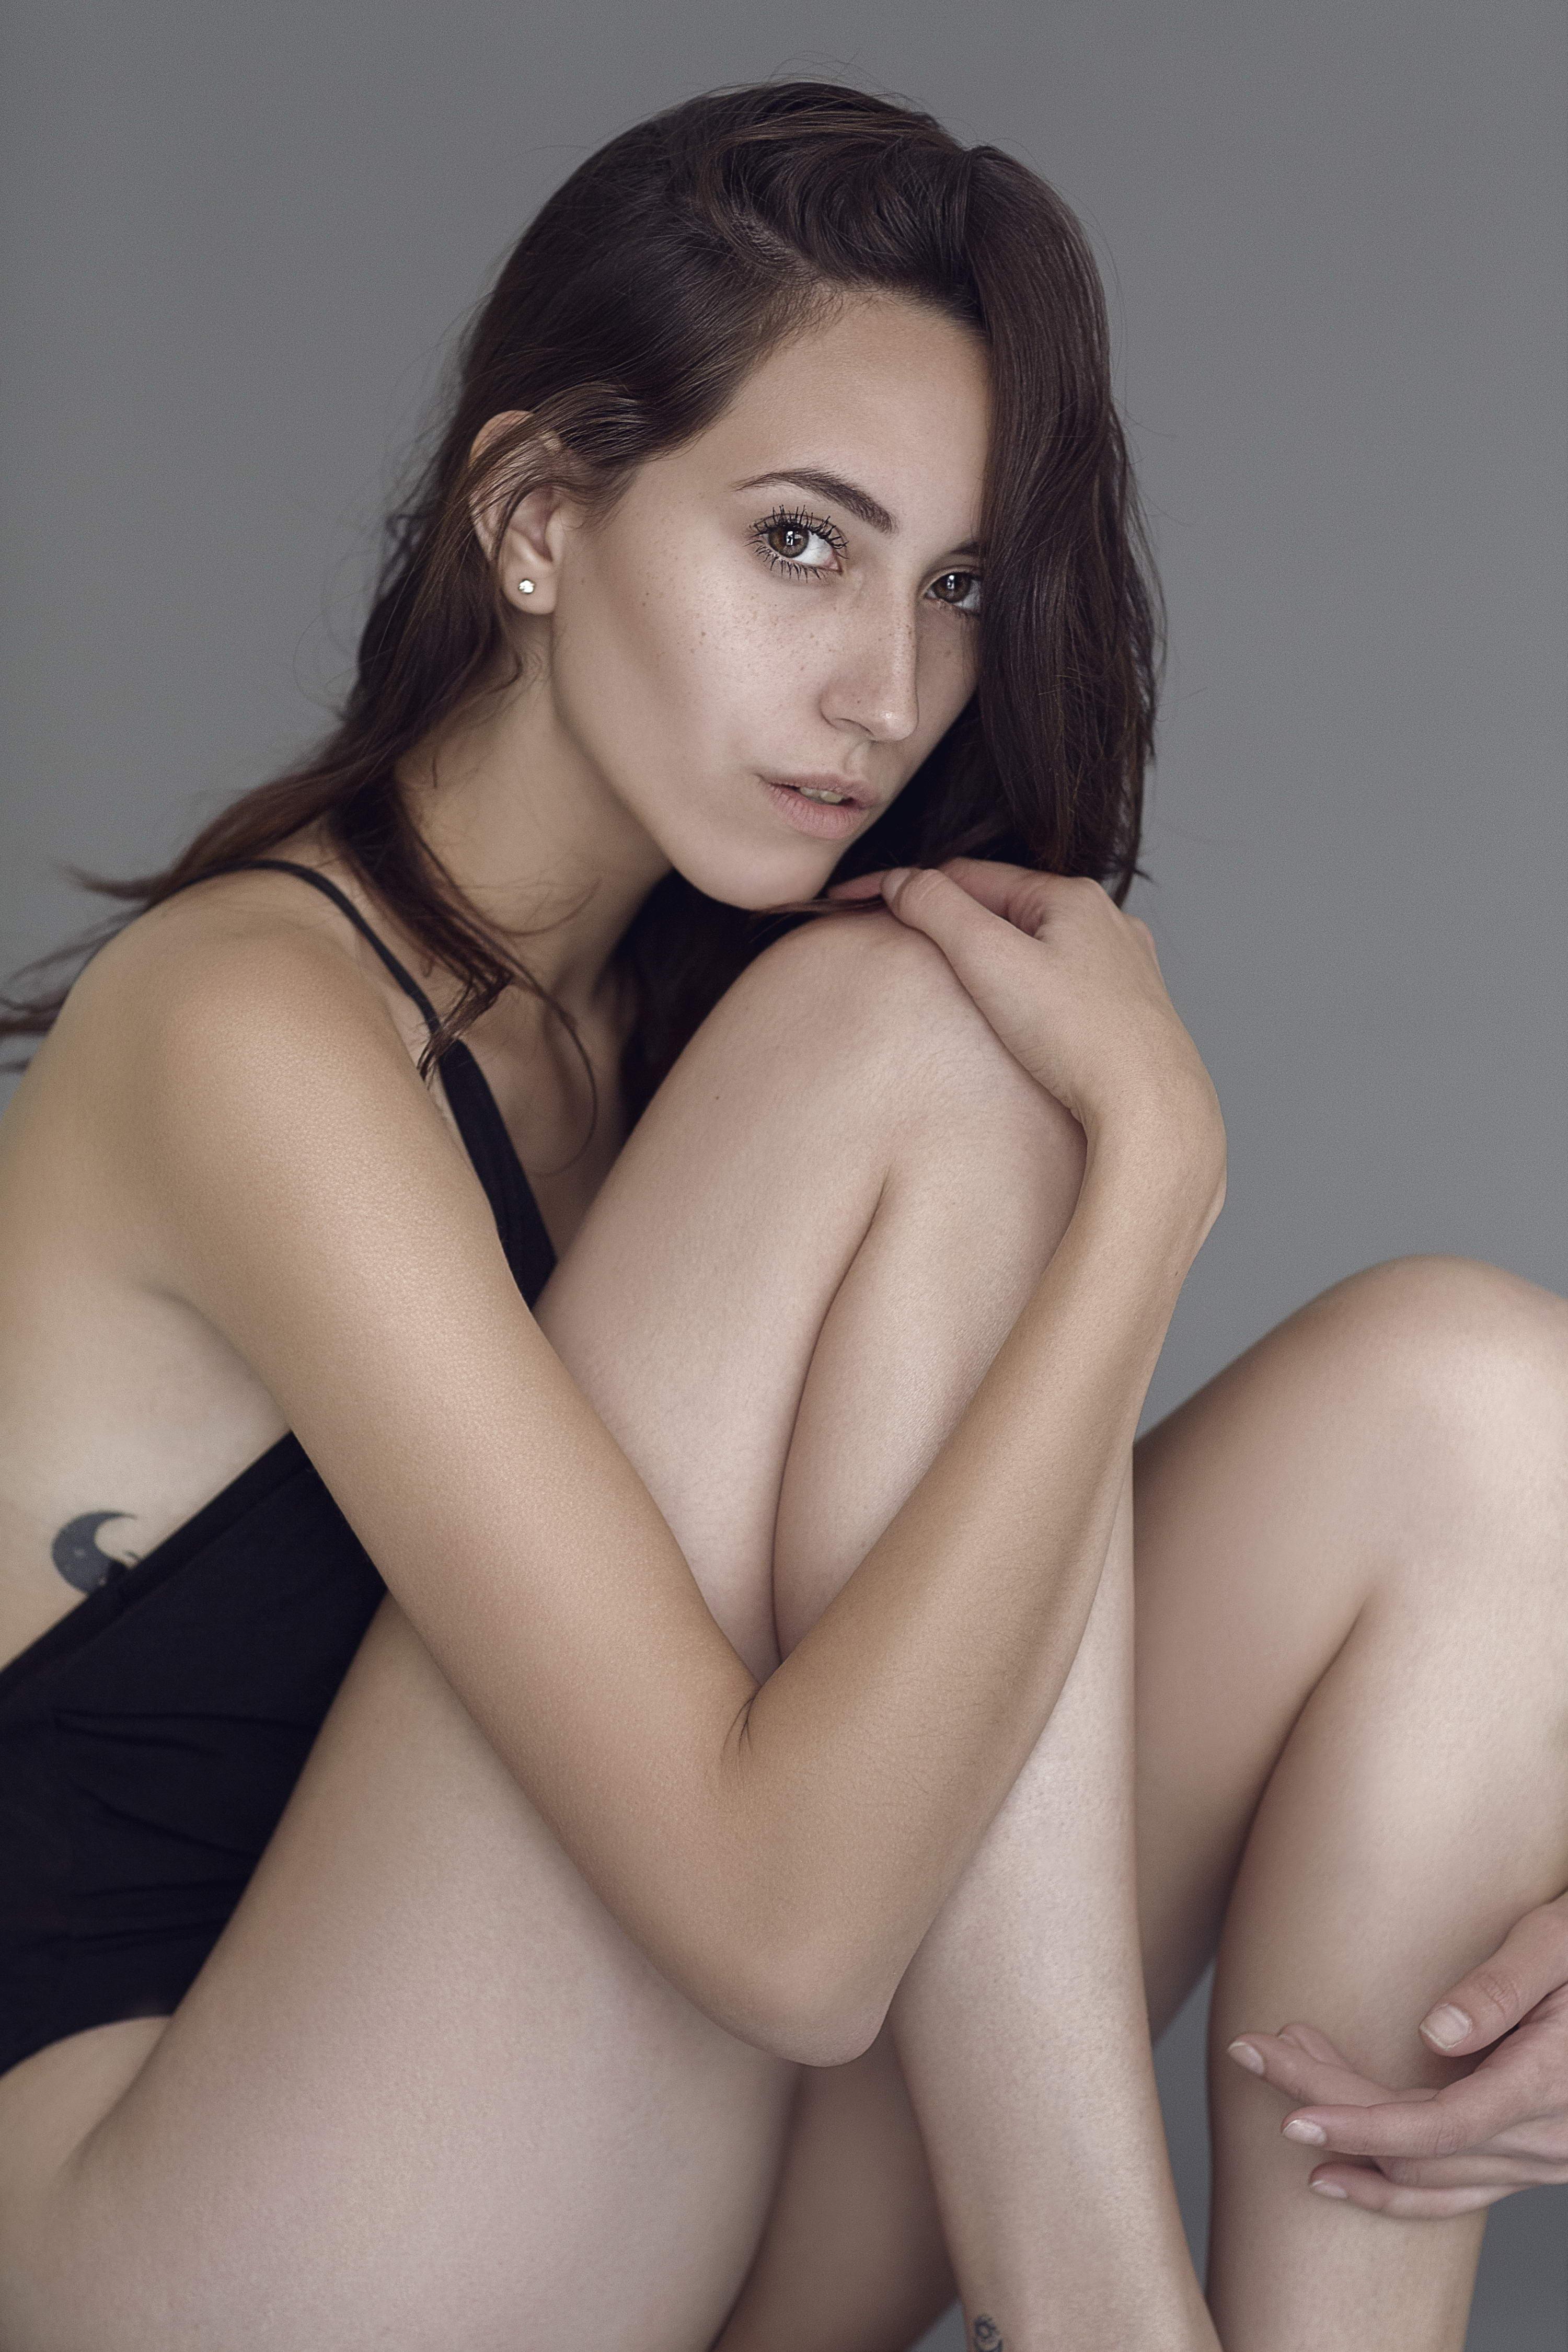 Cute Teen Model And Sexy Escort